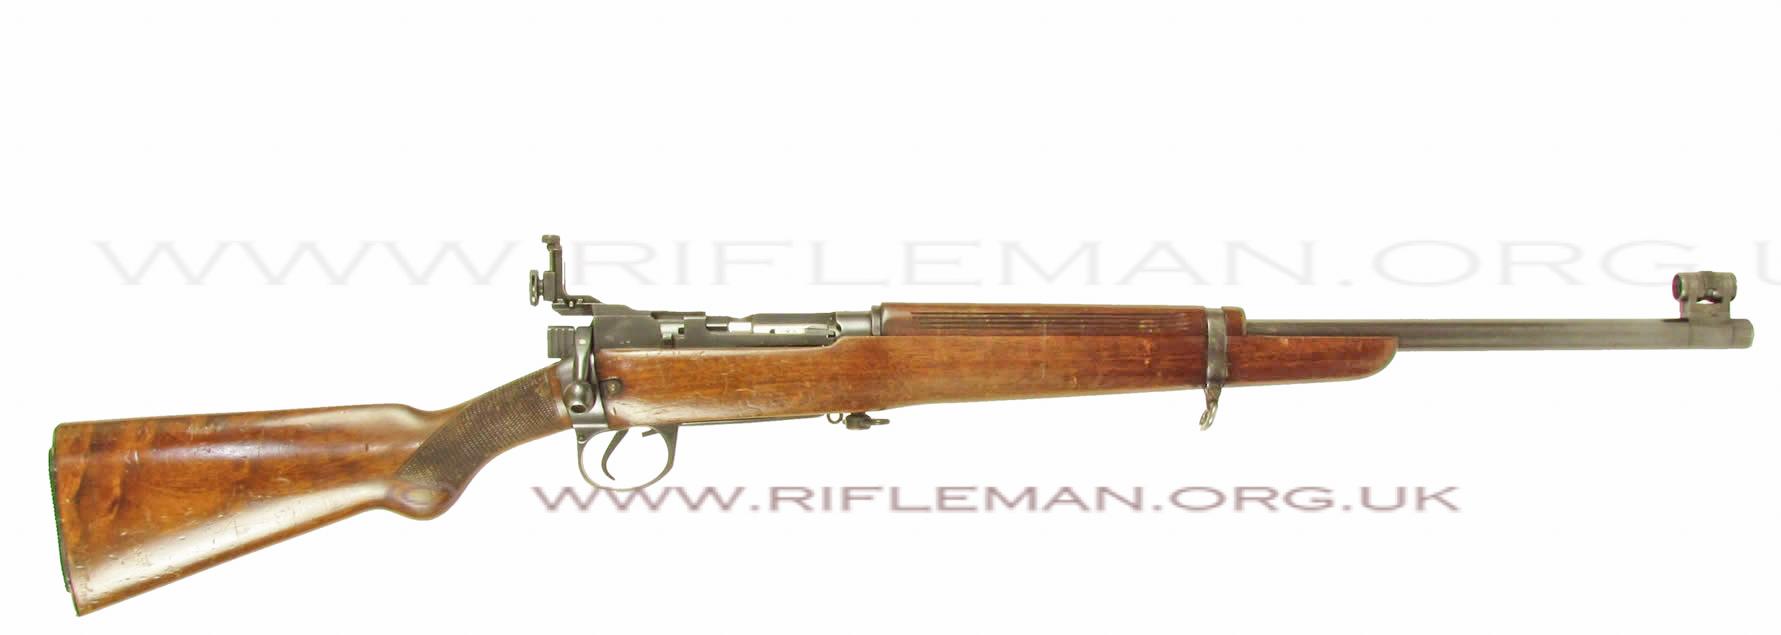 Lee-Enfield Rifle No 6